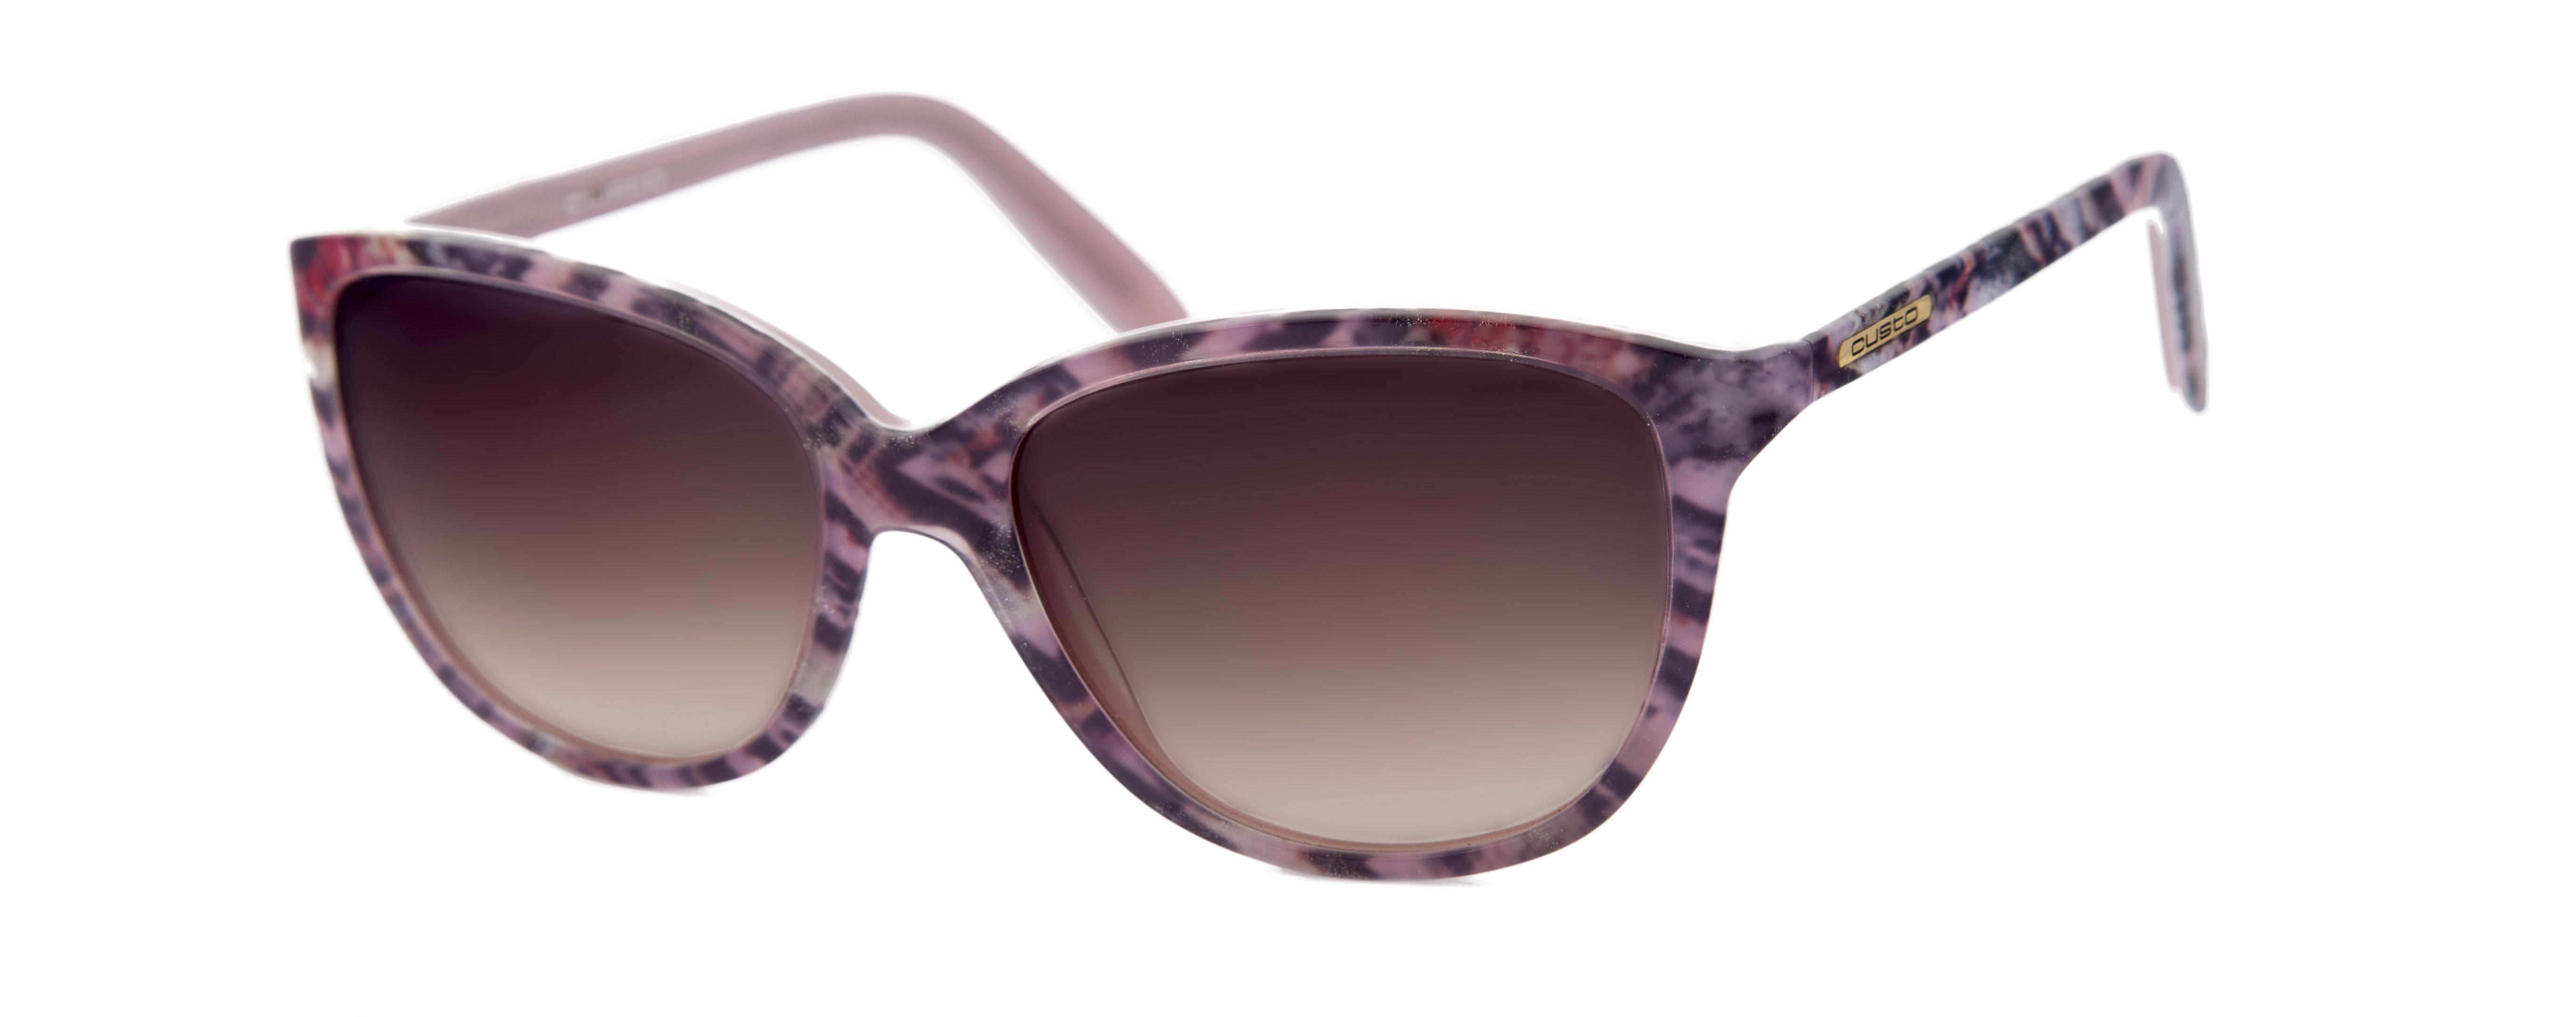 1e09dc50c8 Gafas diseñadas por Custo Dalmau para Opticalia. Montura estampada en tonos  rosas.